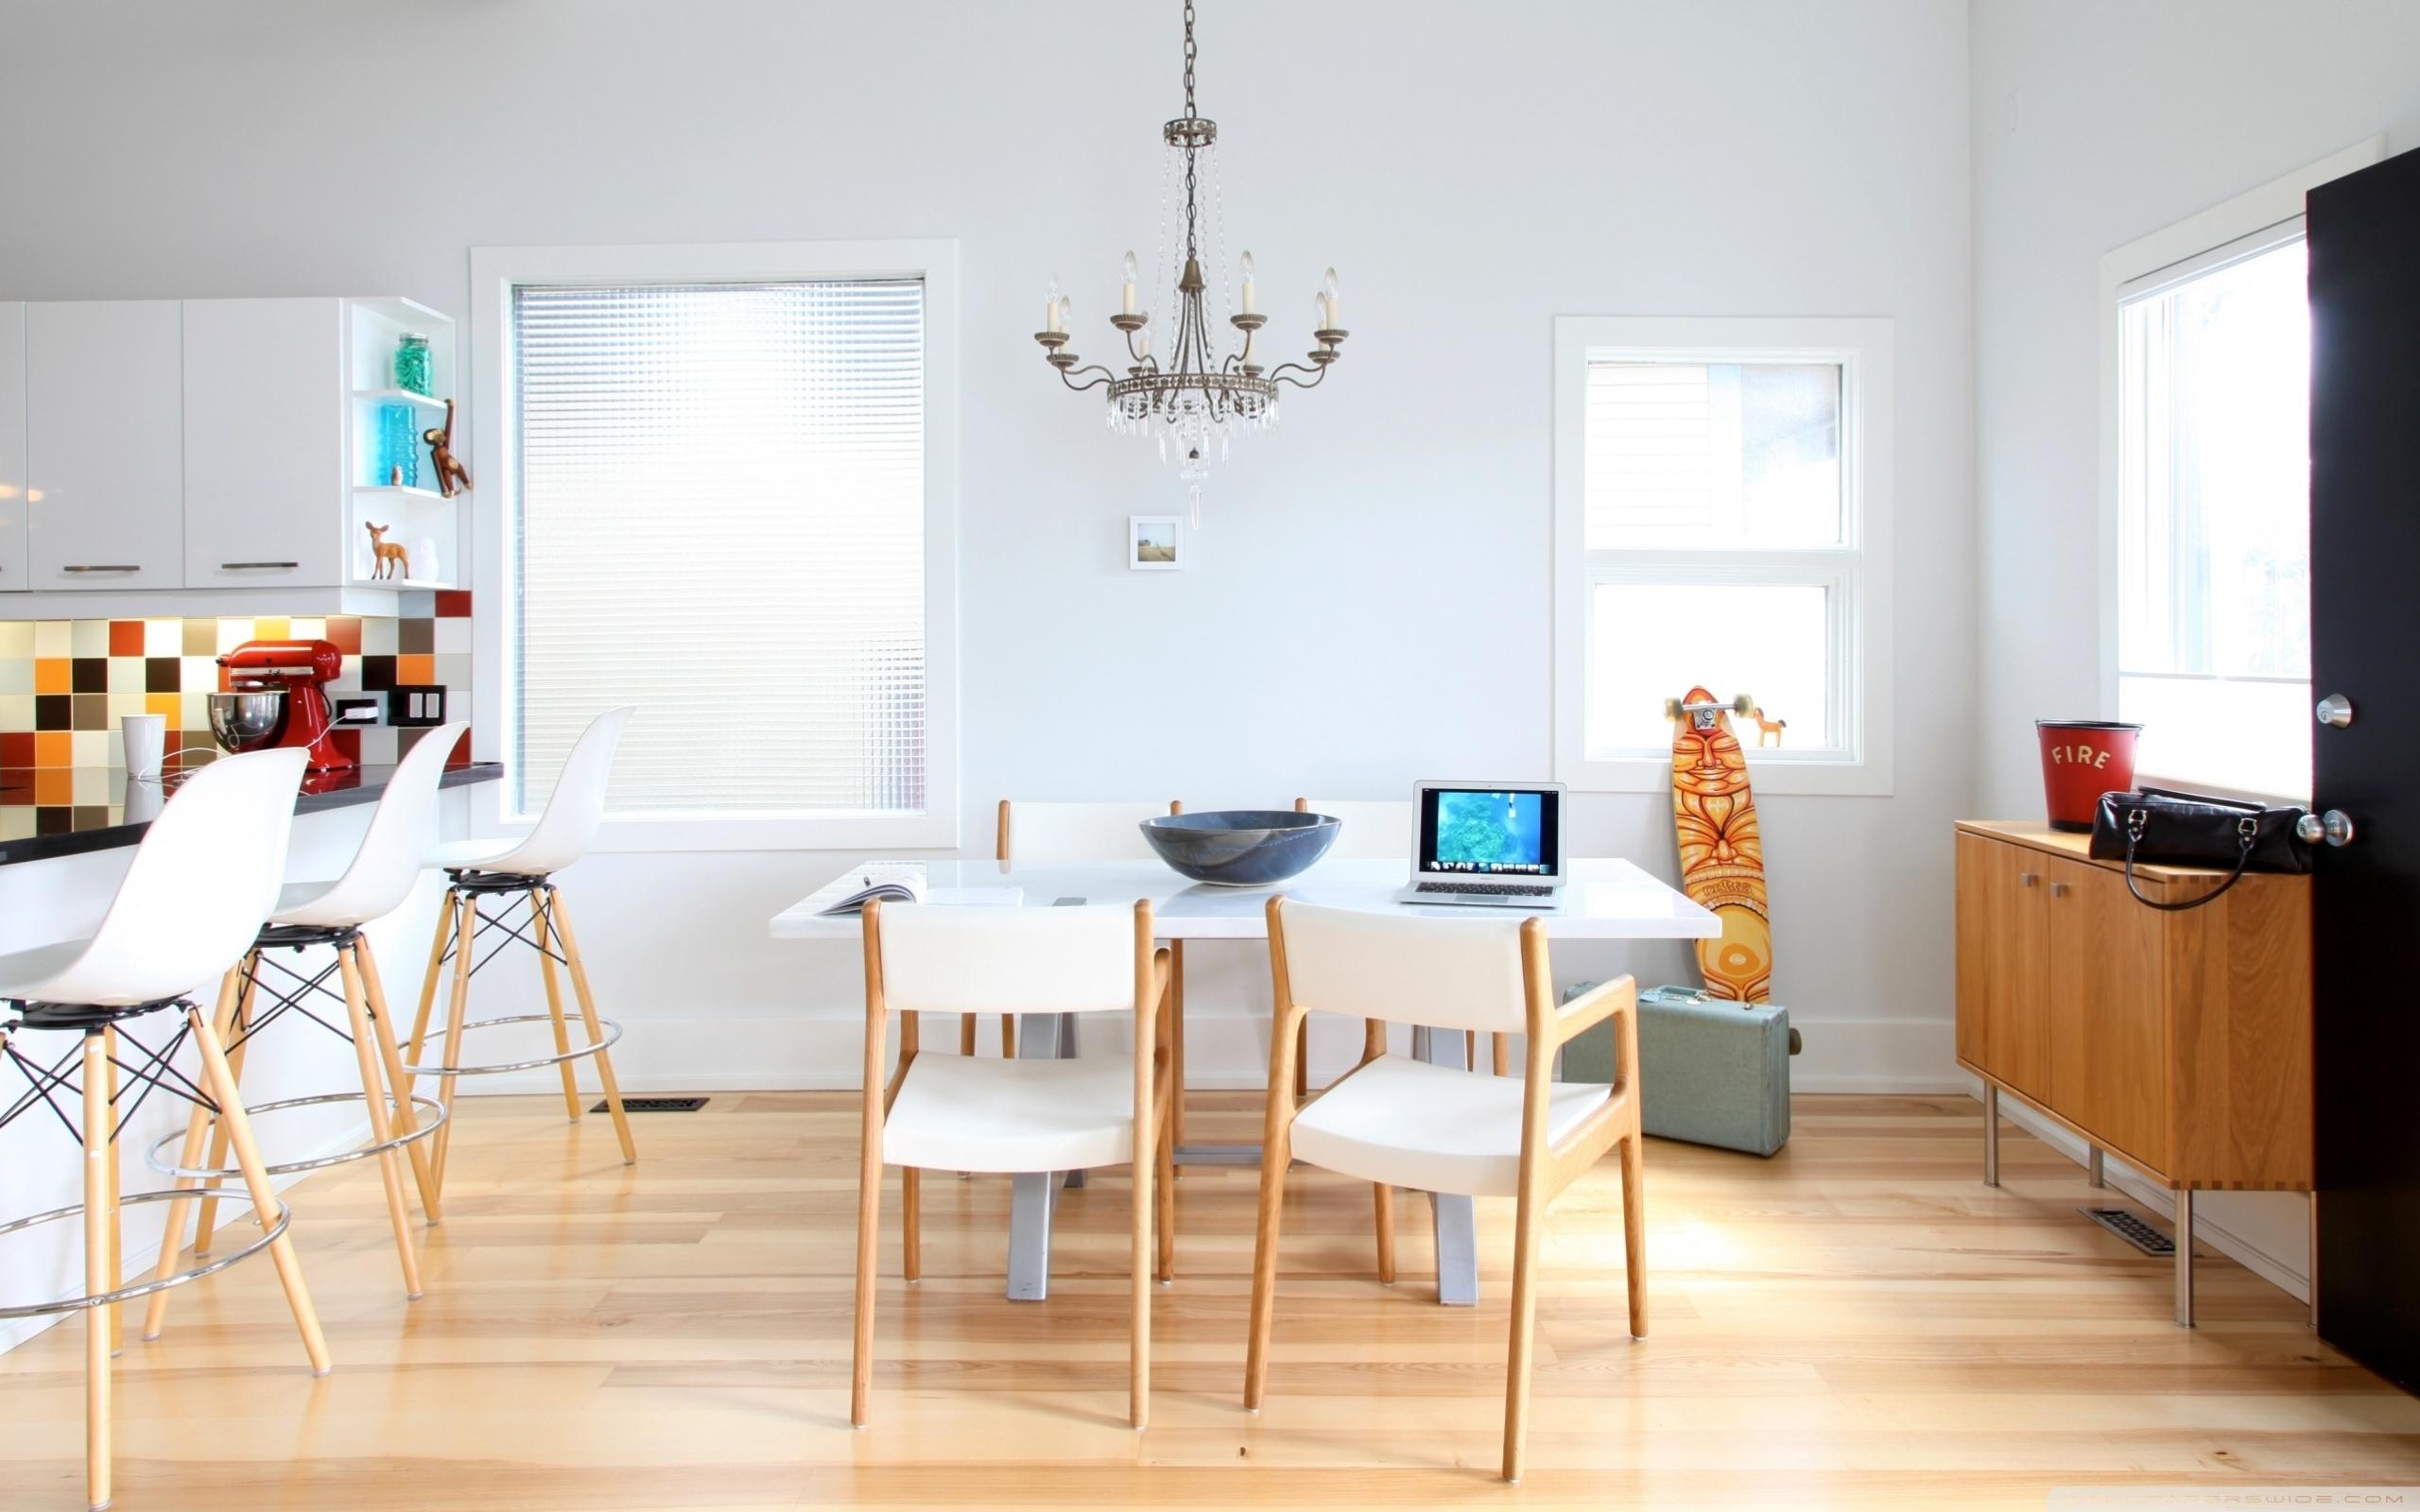 Kitchen 4K HD Desktop Wallpaper For Ultra TV O Dual Monitor